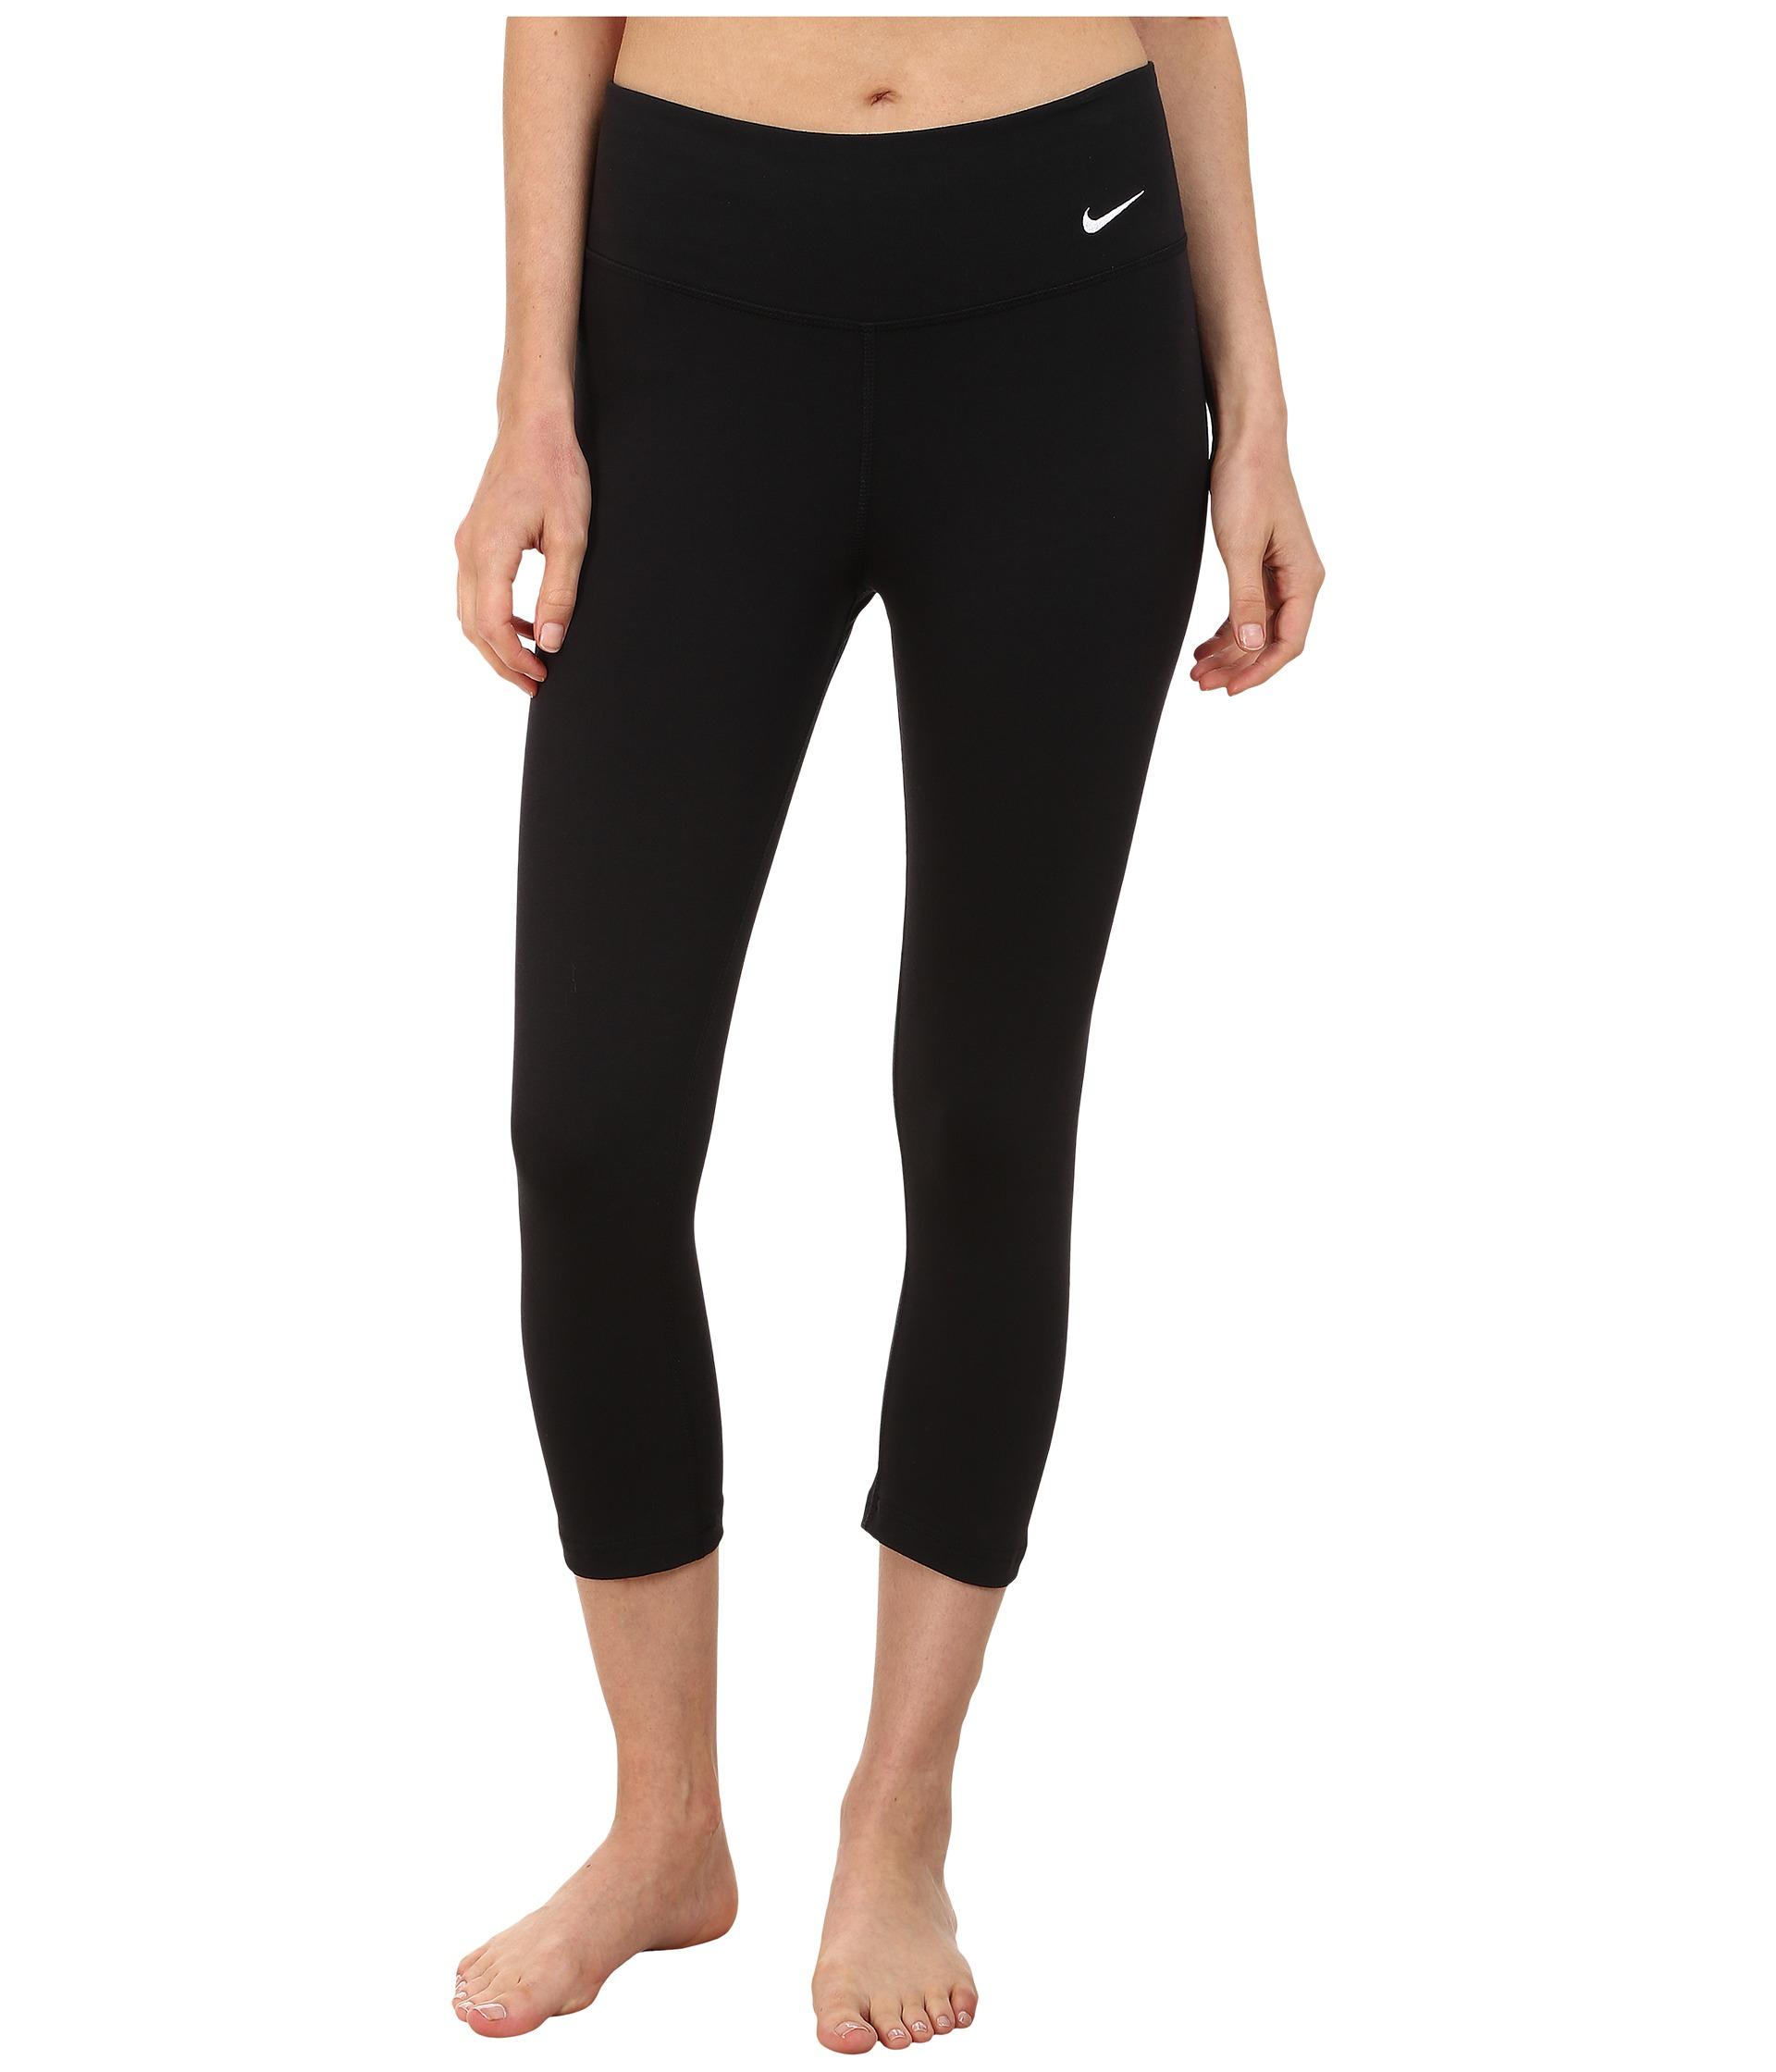 Nike Legend 2.0 Tight Dri-fit™ Cotton Capri in Black | Lyst